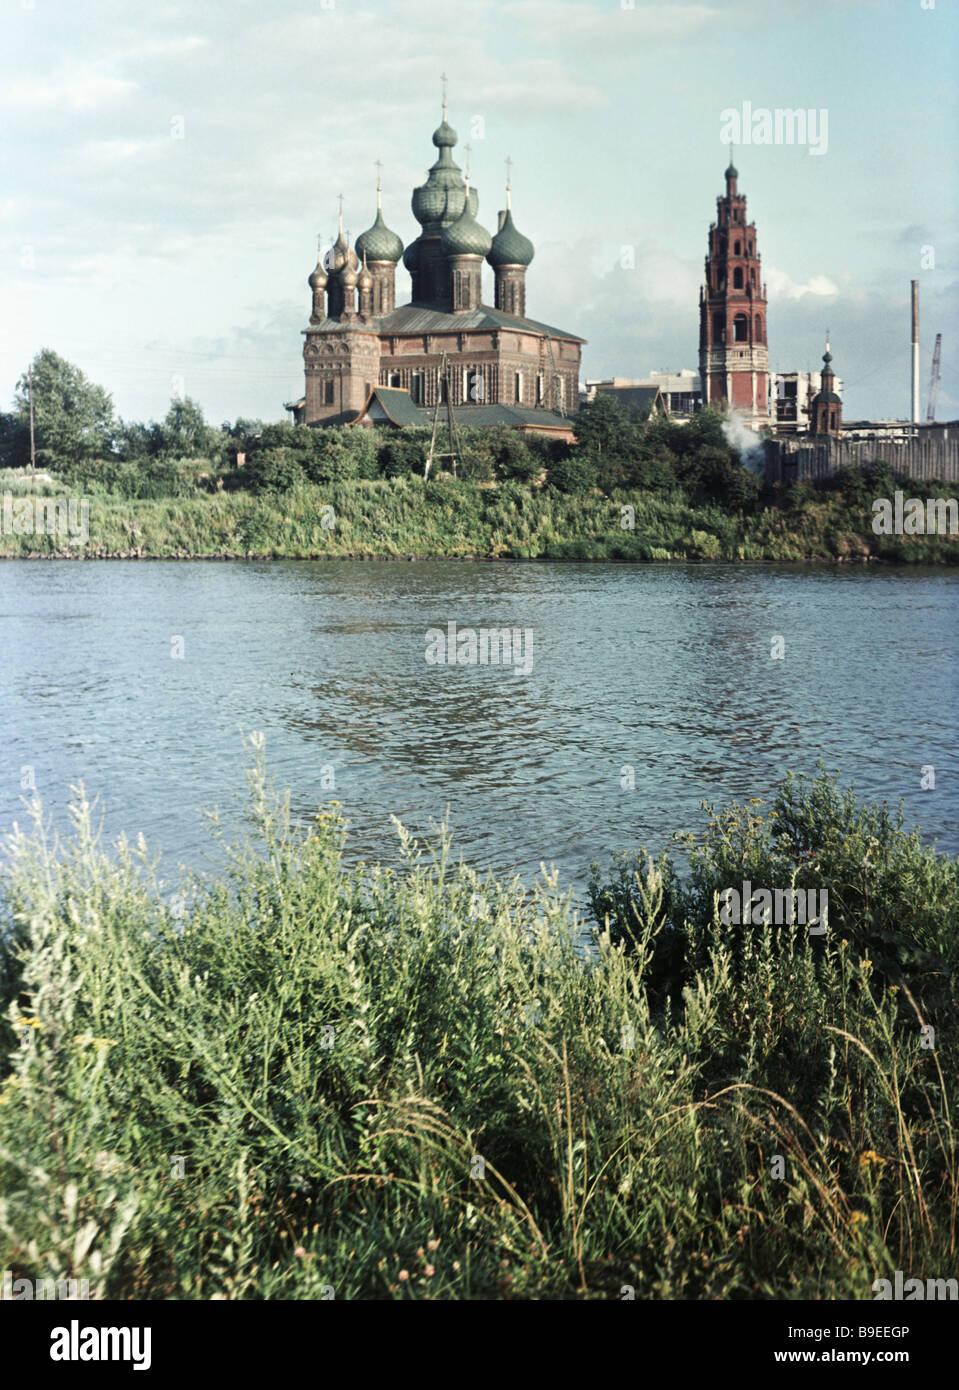 Belfry and church of John the Baptist in Tolchkov near Yaroslavl built 1671 1687 - Stock Image